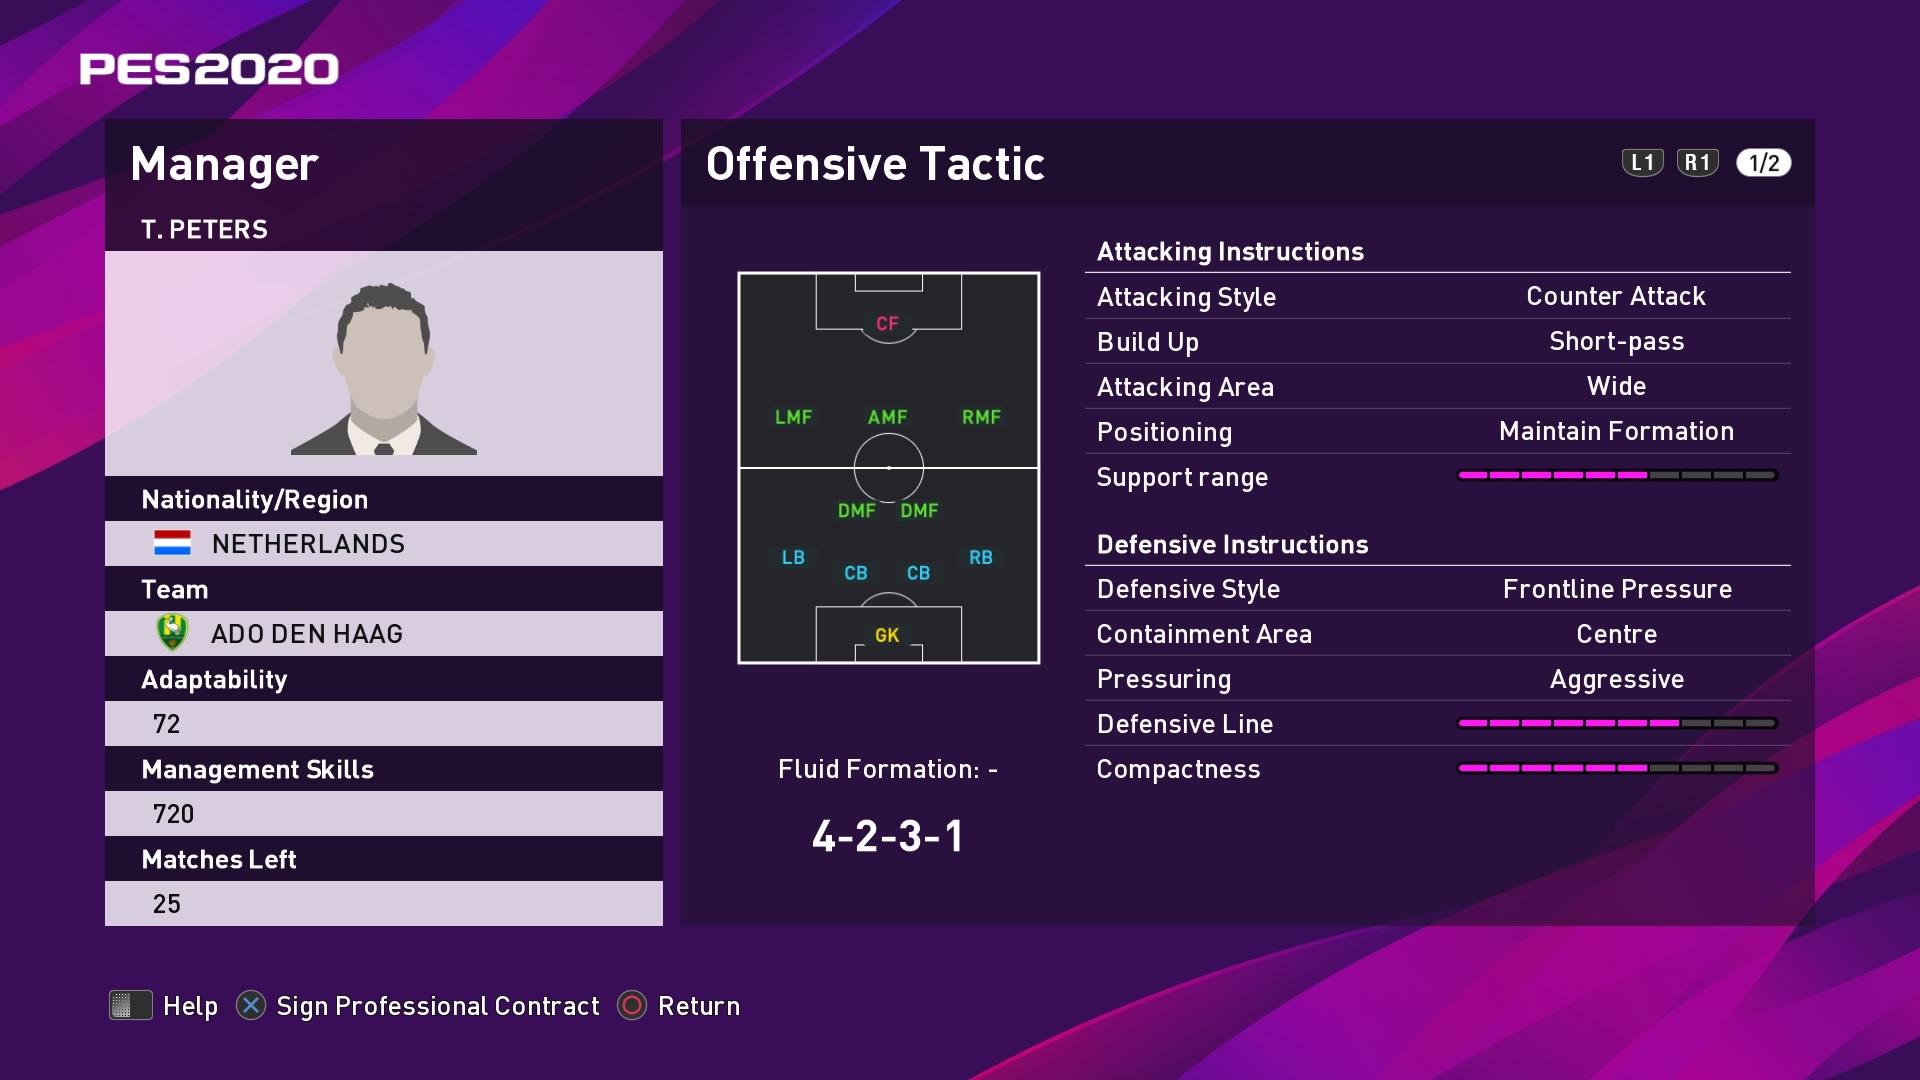 T. Peters (Alfons Groenendijk) Offensive Tactic in PES 2020 myClub